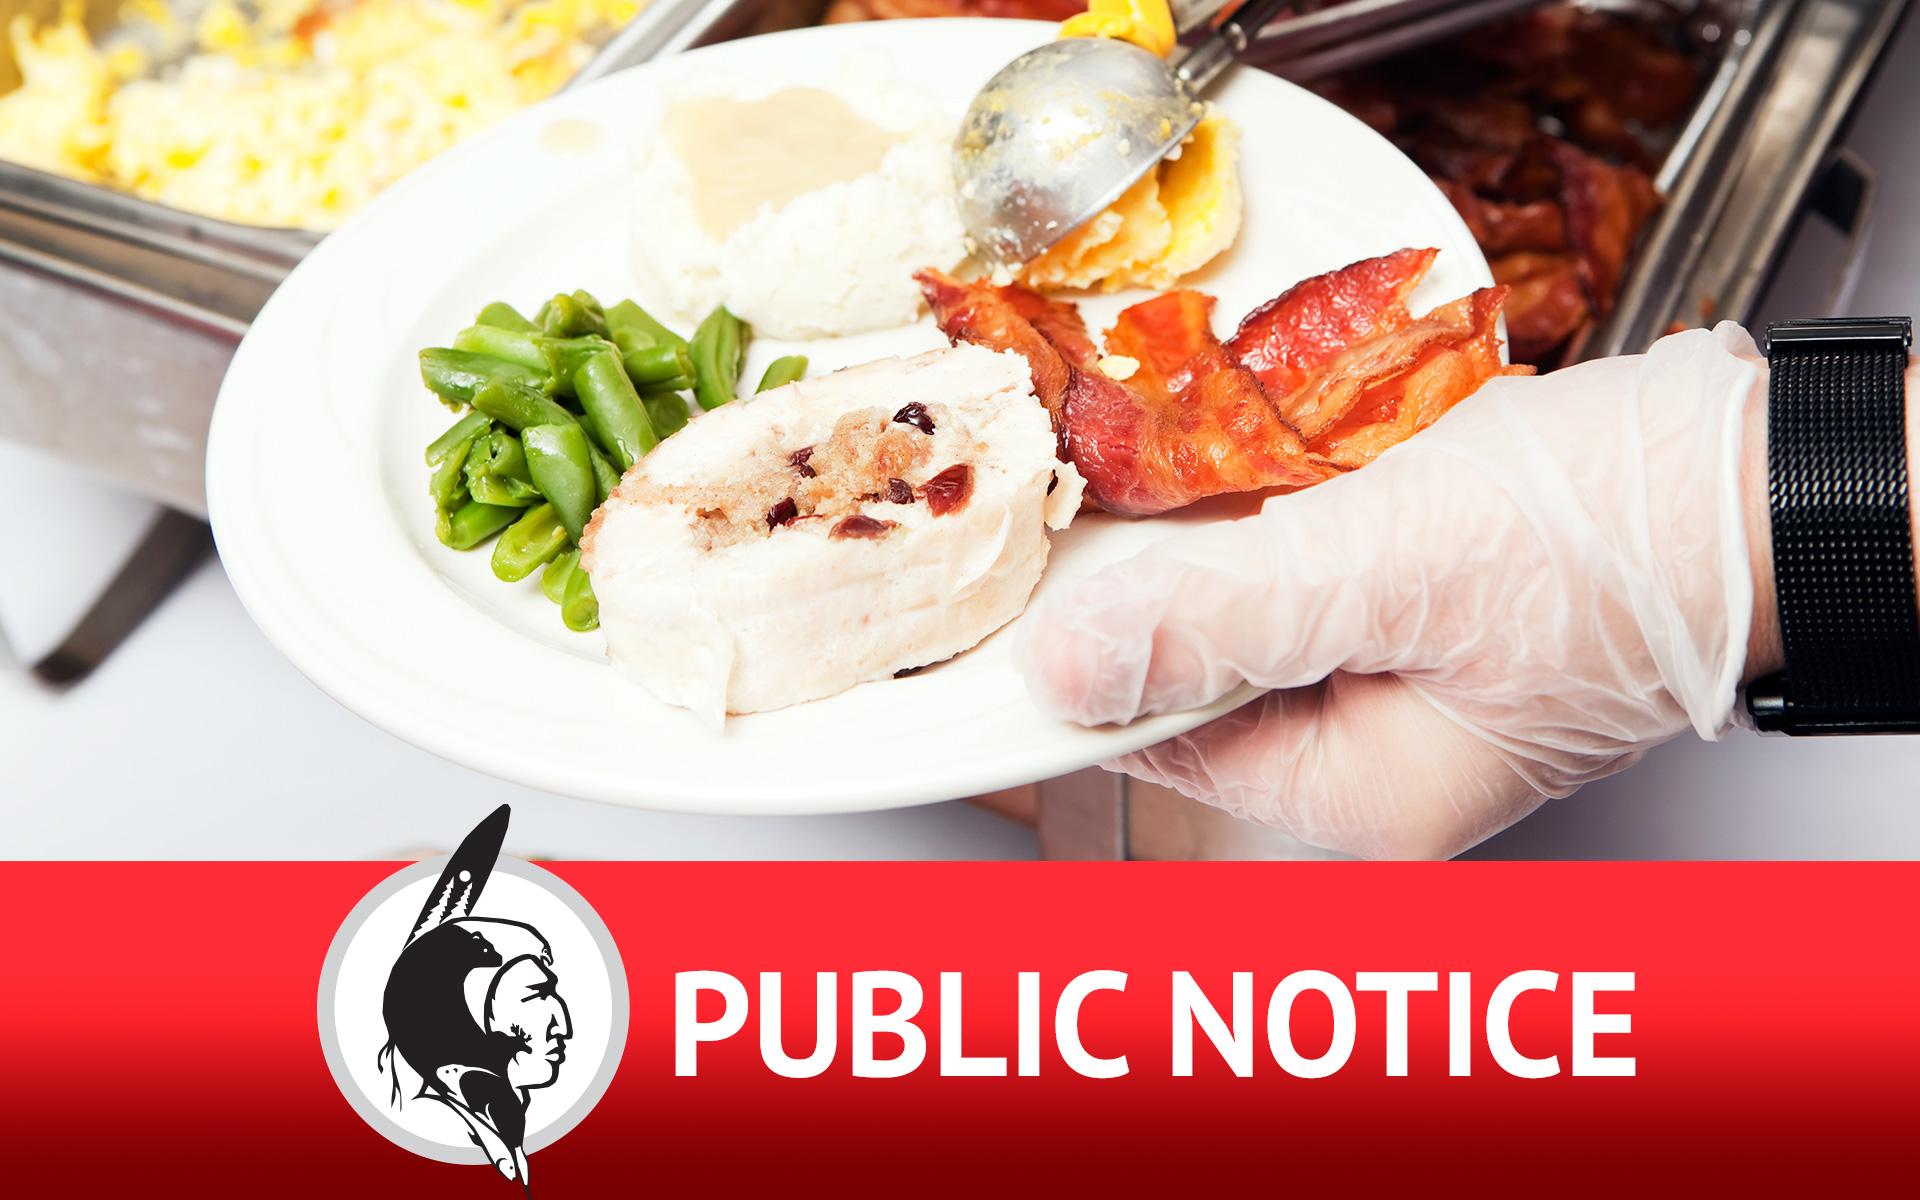 Public Service Announcement Regarding Food Handling